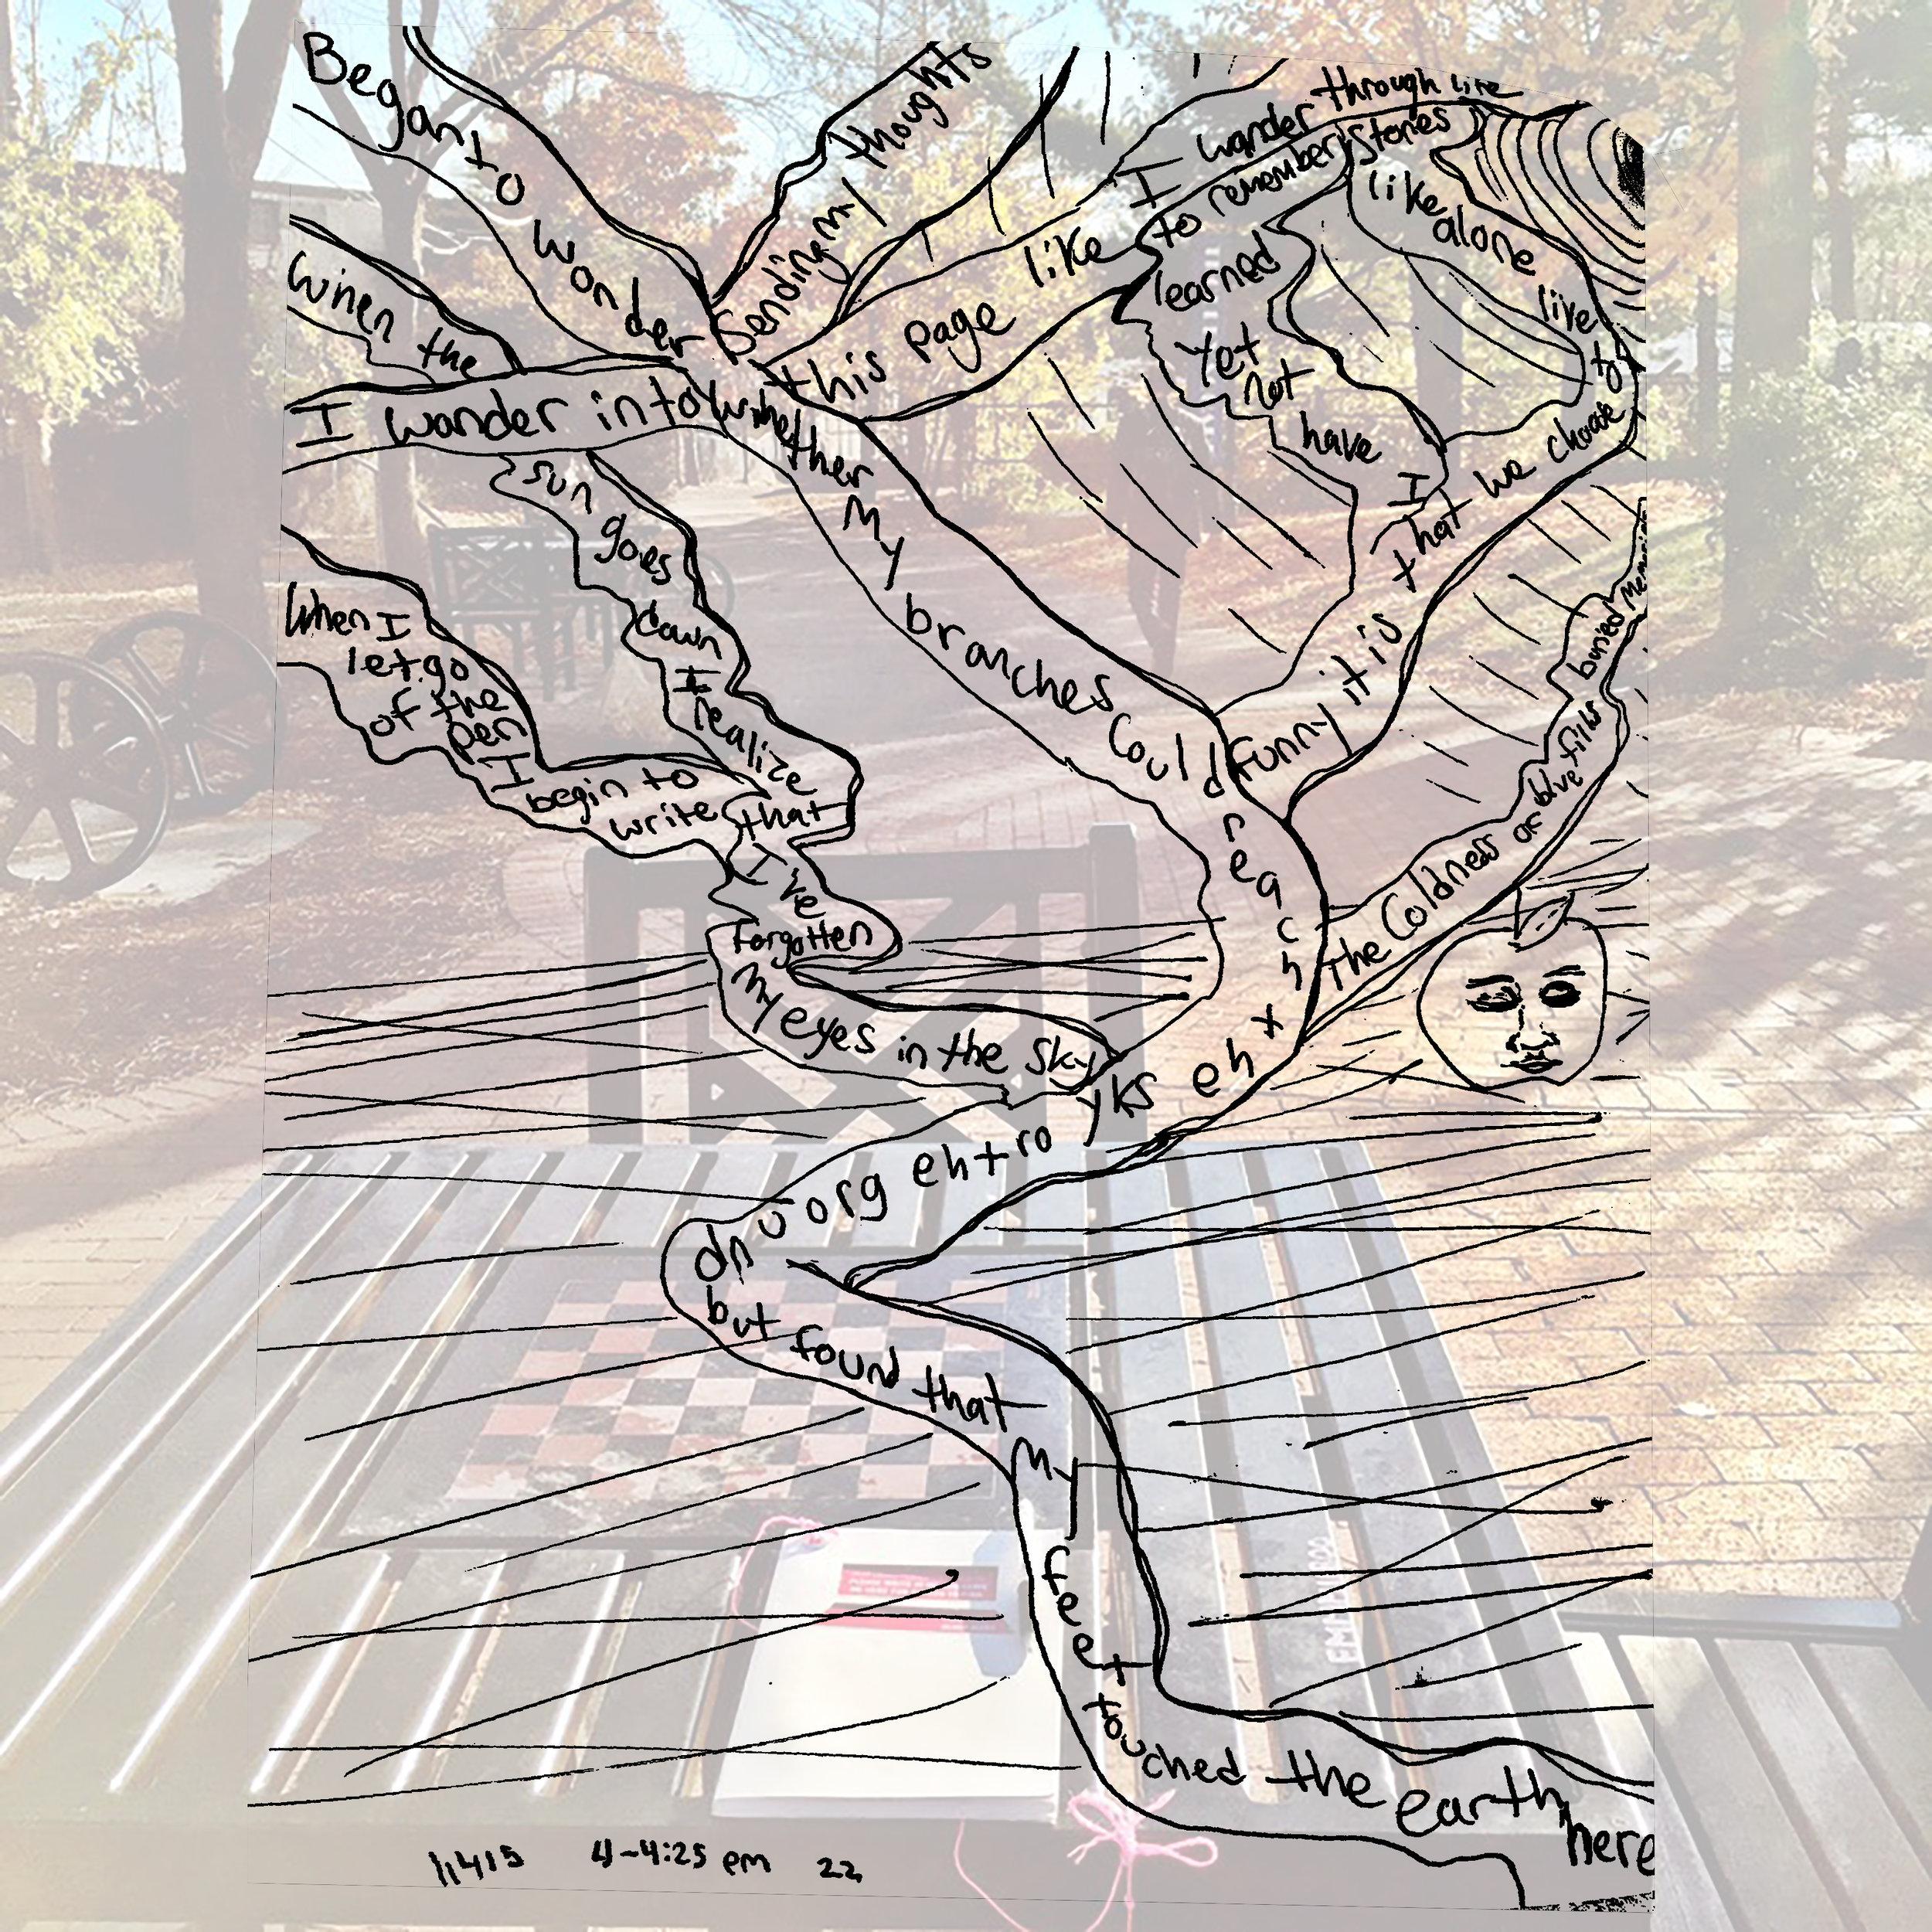 151104_Somerville Bike Path 2.jpg